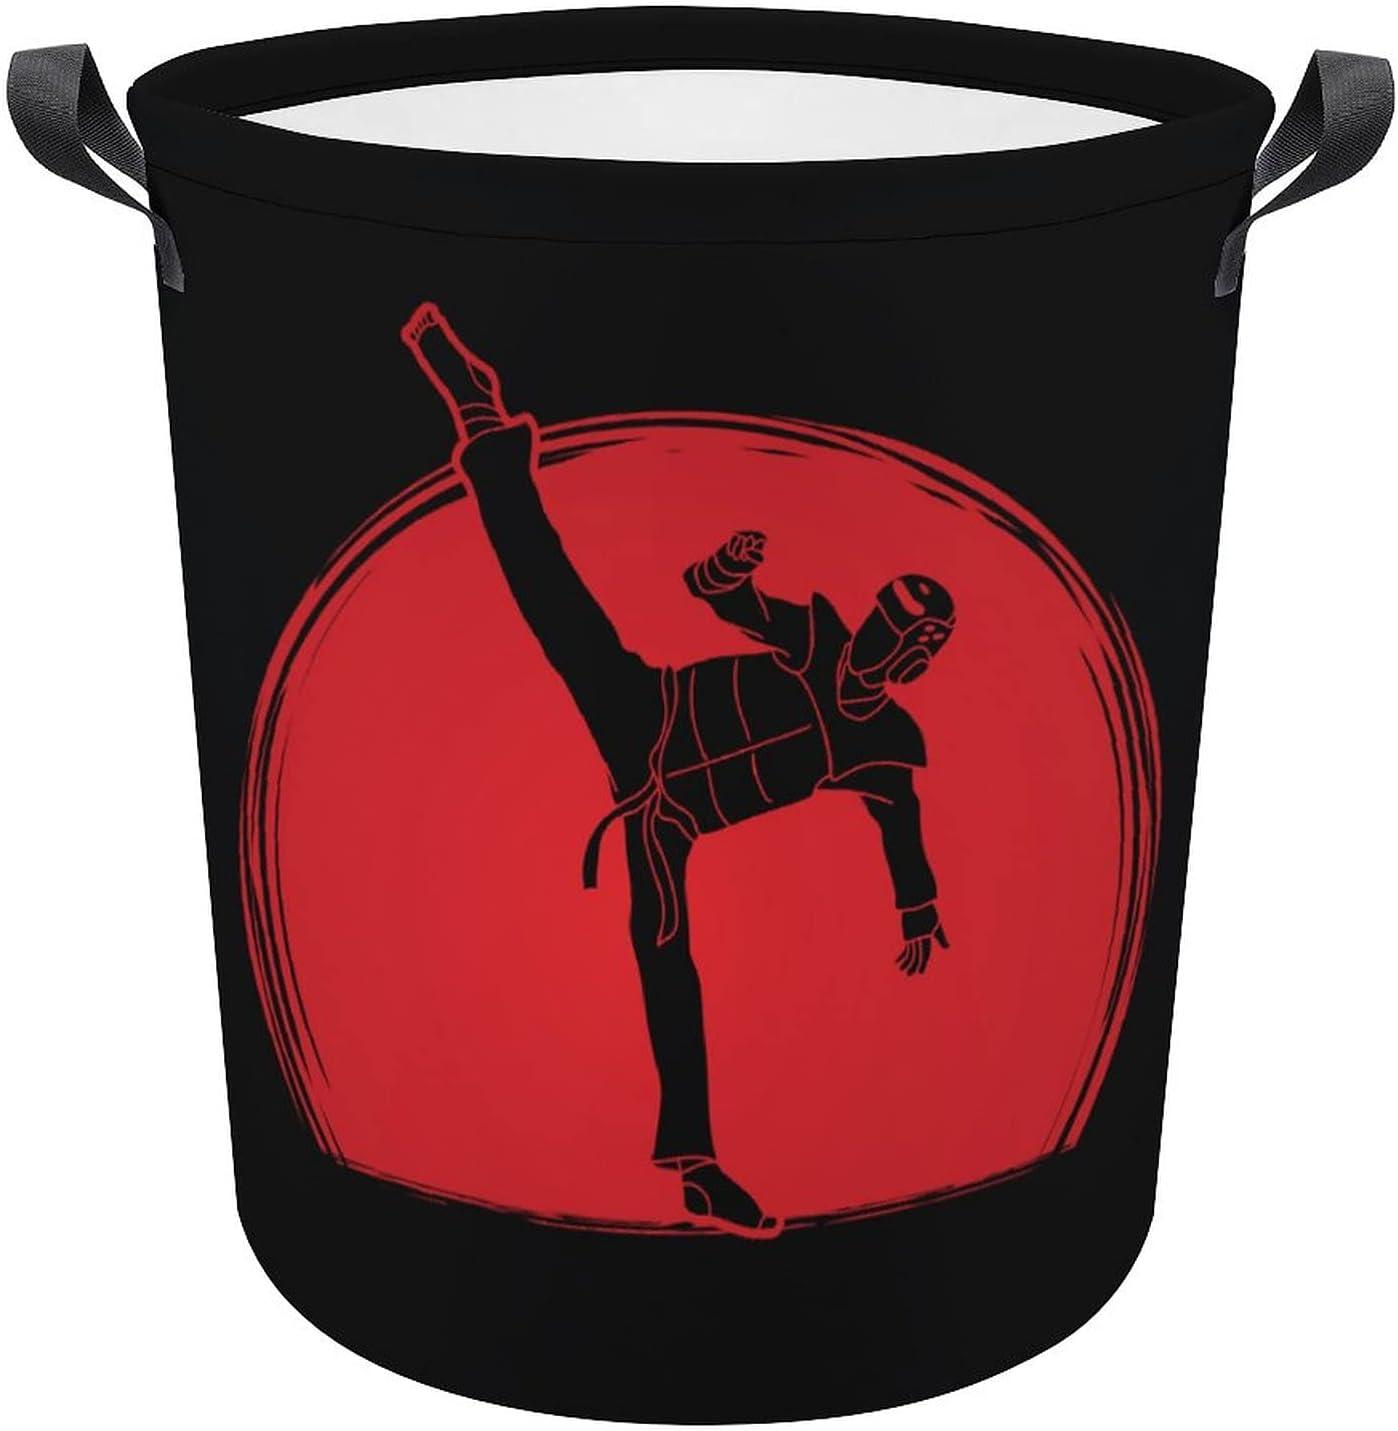 Funny Taekwondo High Kick on Hamper Oxford Gift Dealing full price reduction Large discharge sale Laundry Sunlight